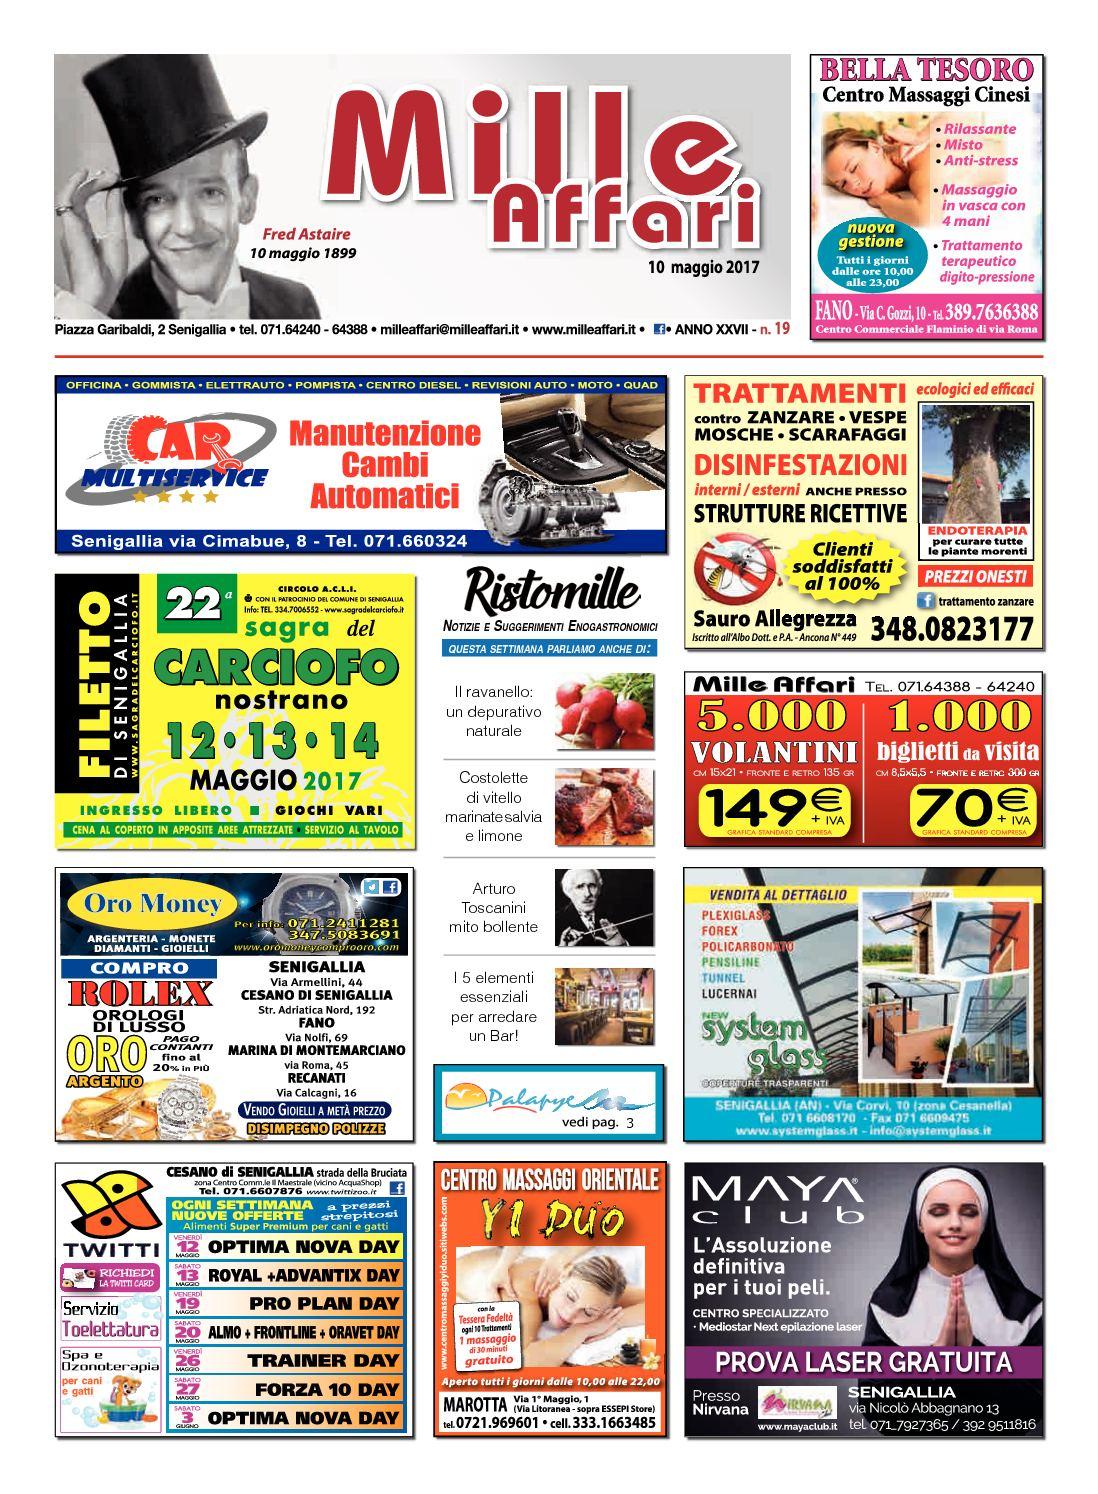 Calaméo - Milleaffari N°19 Del 10.05.17 31c46cb7881